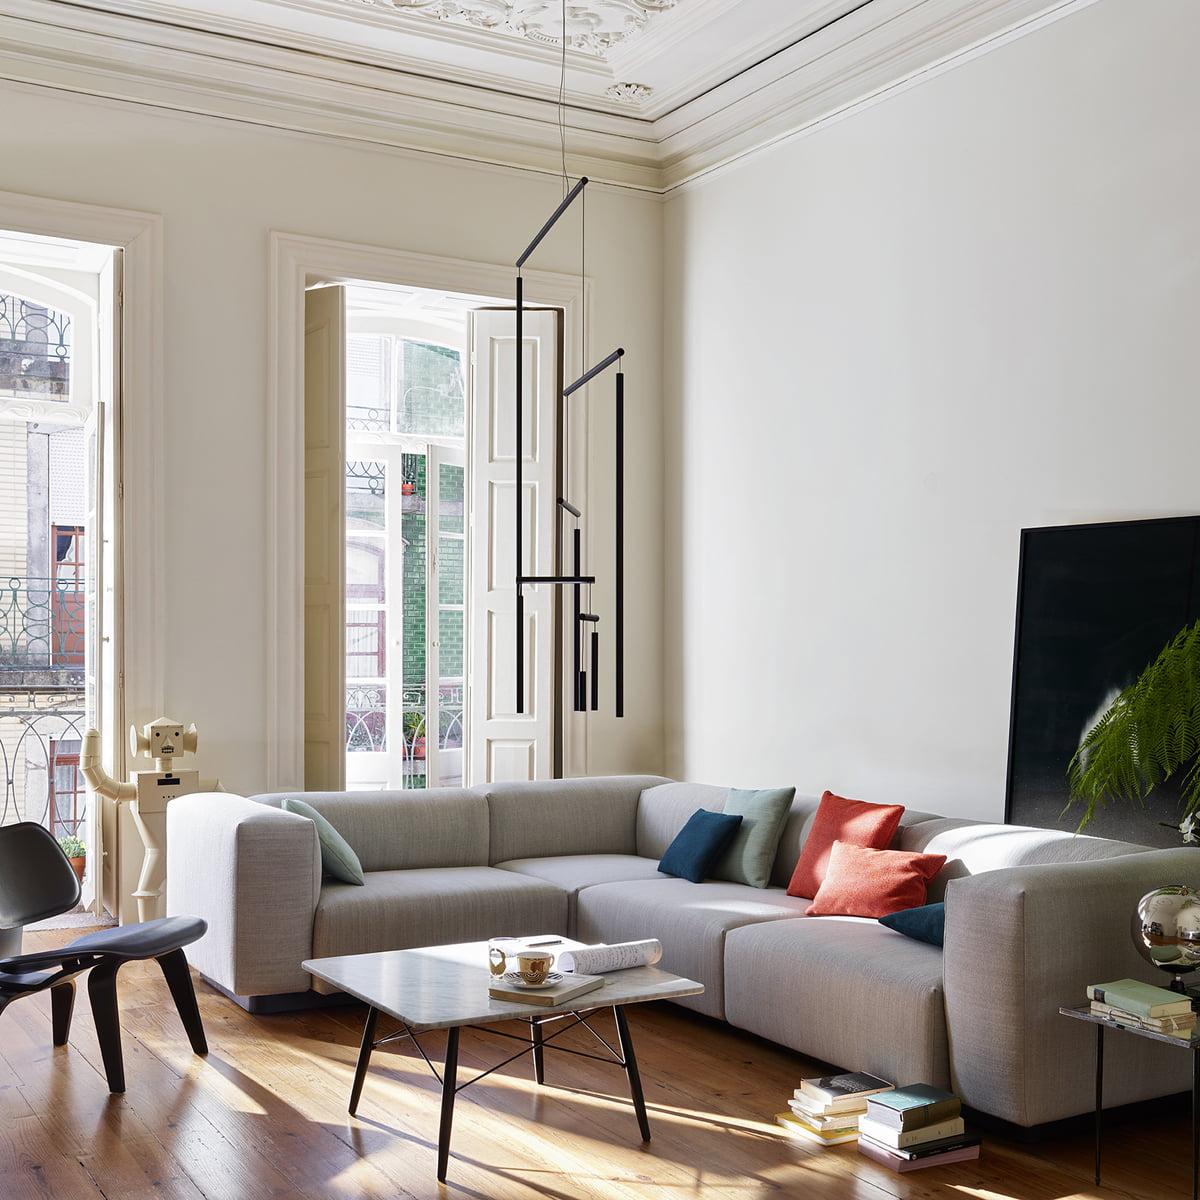 Bodennahes Und Horizontal Ausgeprägtes Sofa · Der Eames Coffee Table ...